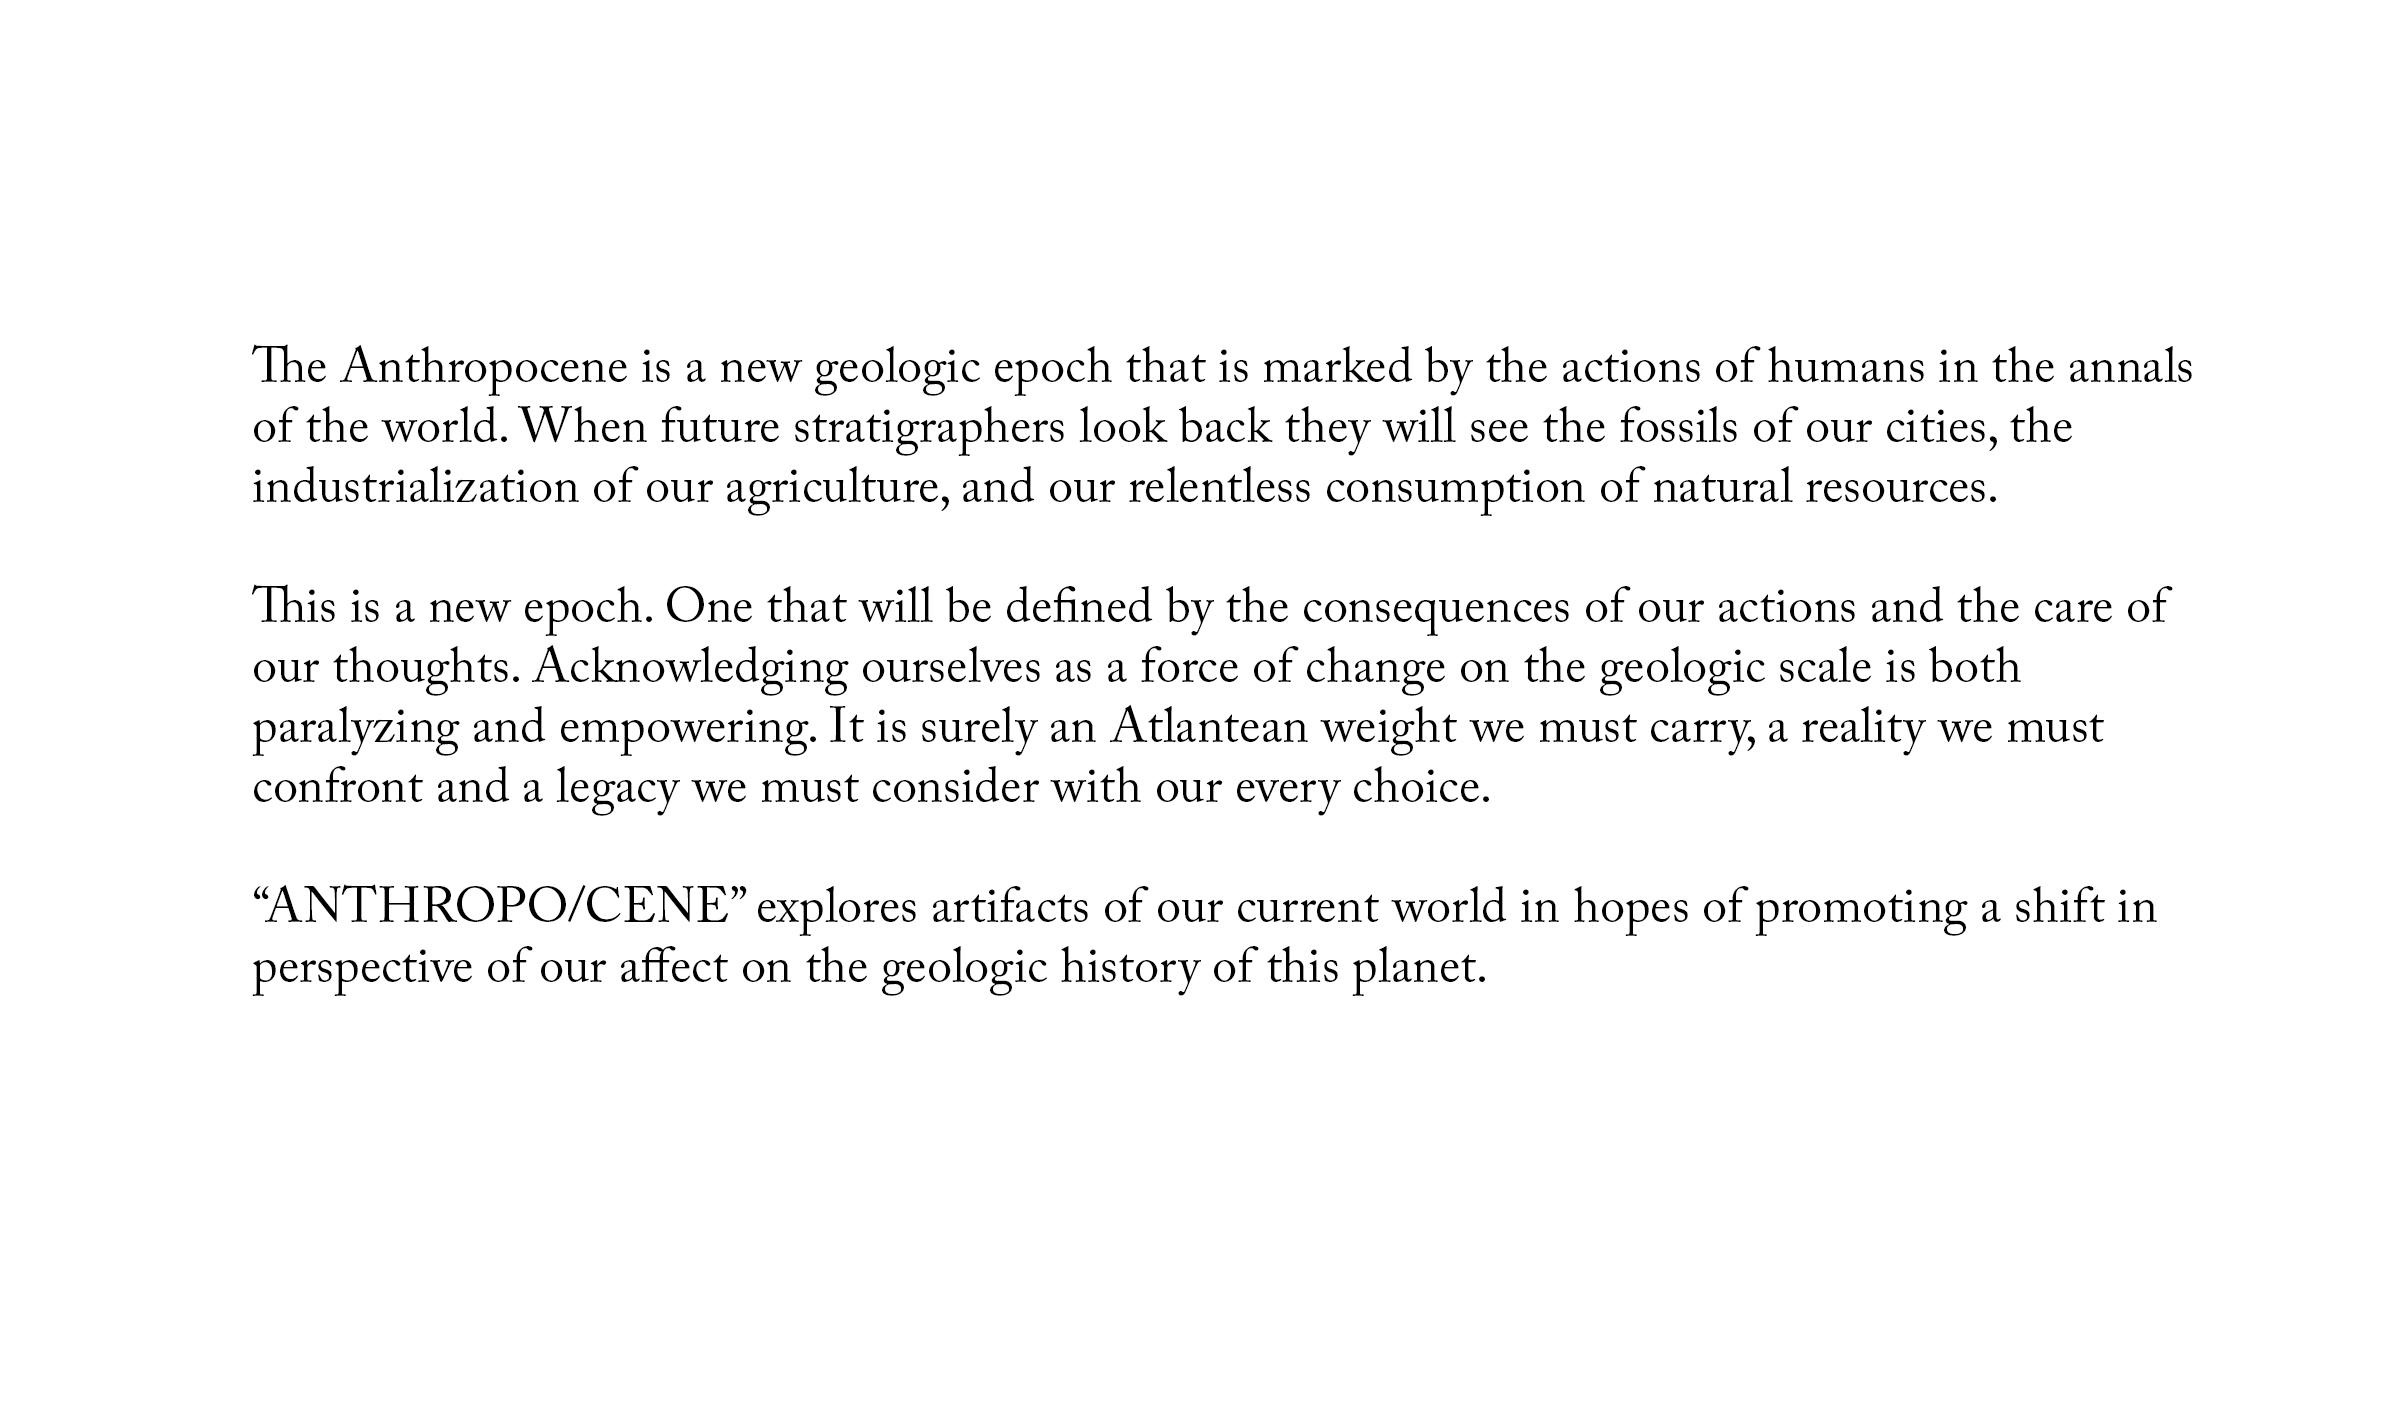 ANTHROPOCENE statement for website.jpg